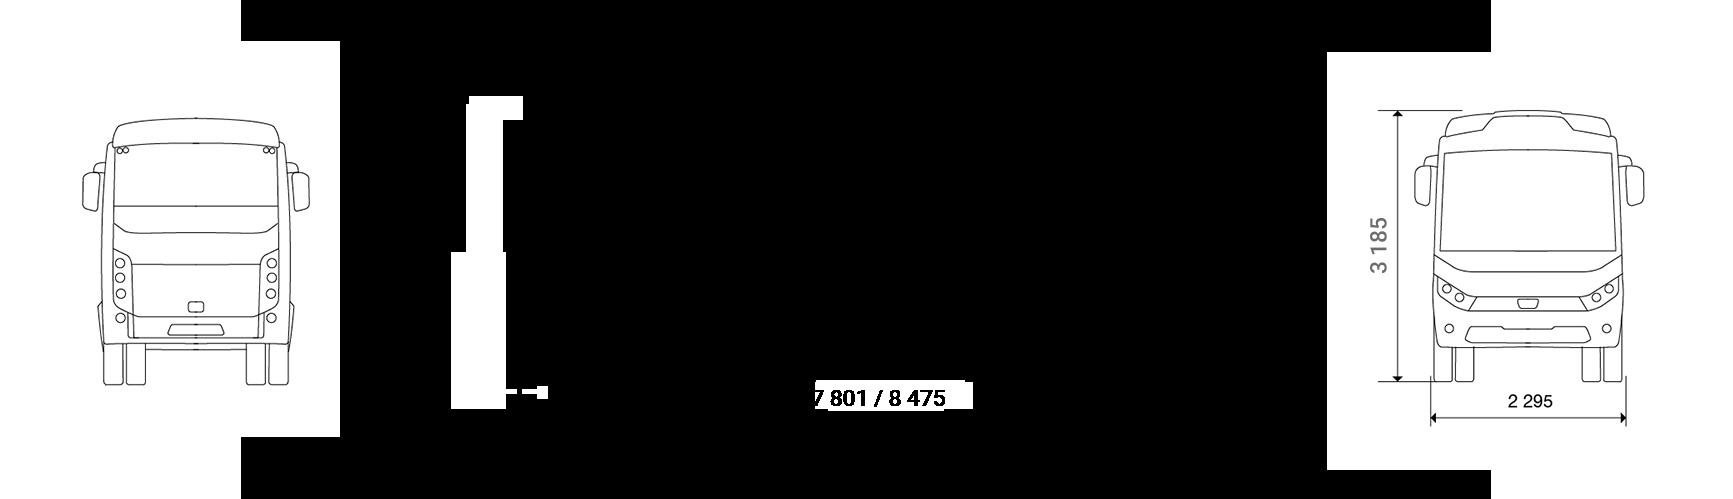 navigo_u_tech